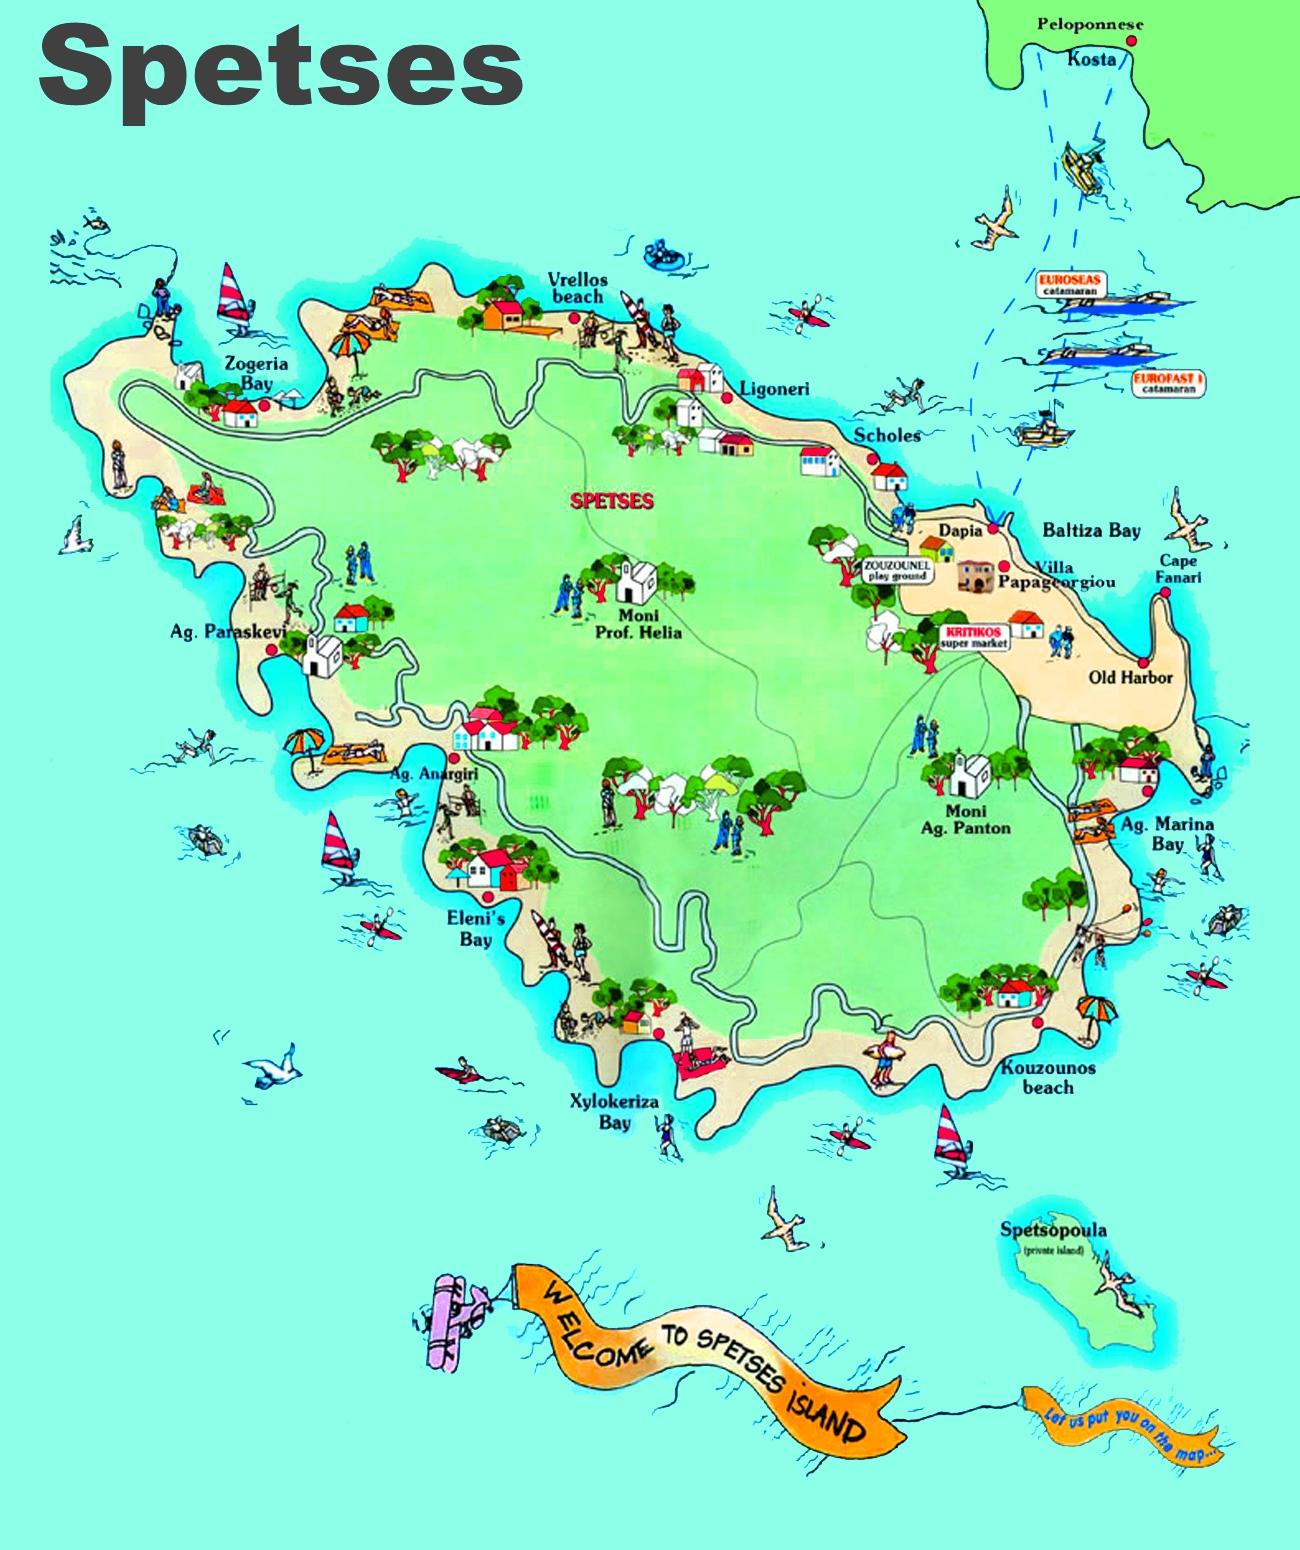 Spetses Maps Greece Maps of Spetses Island